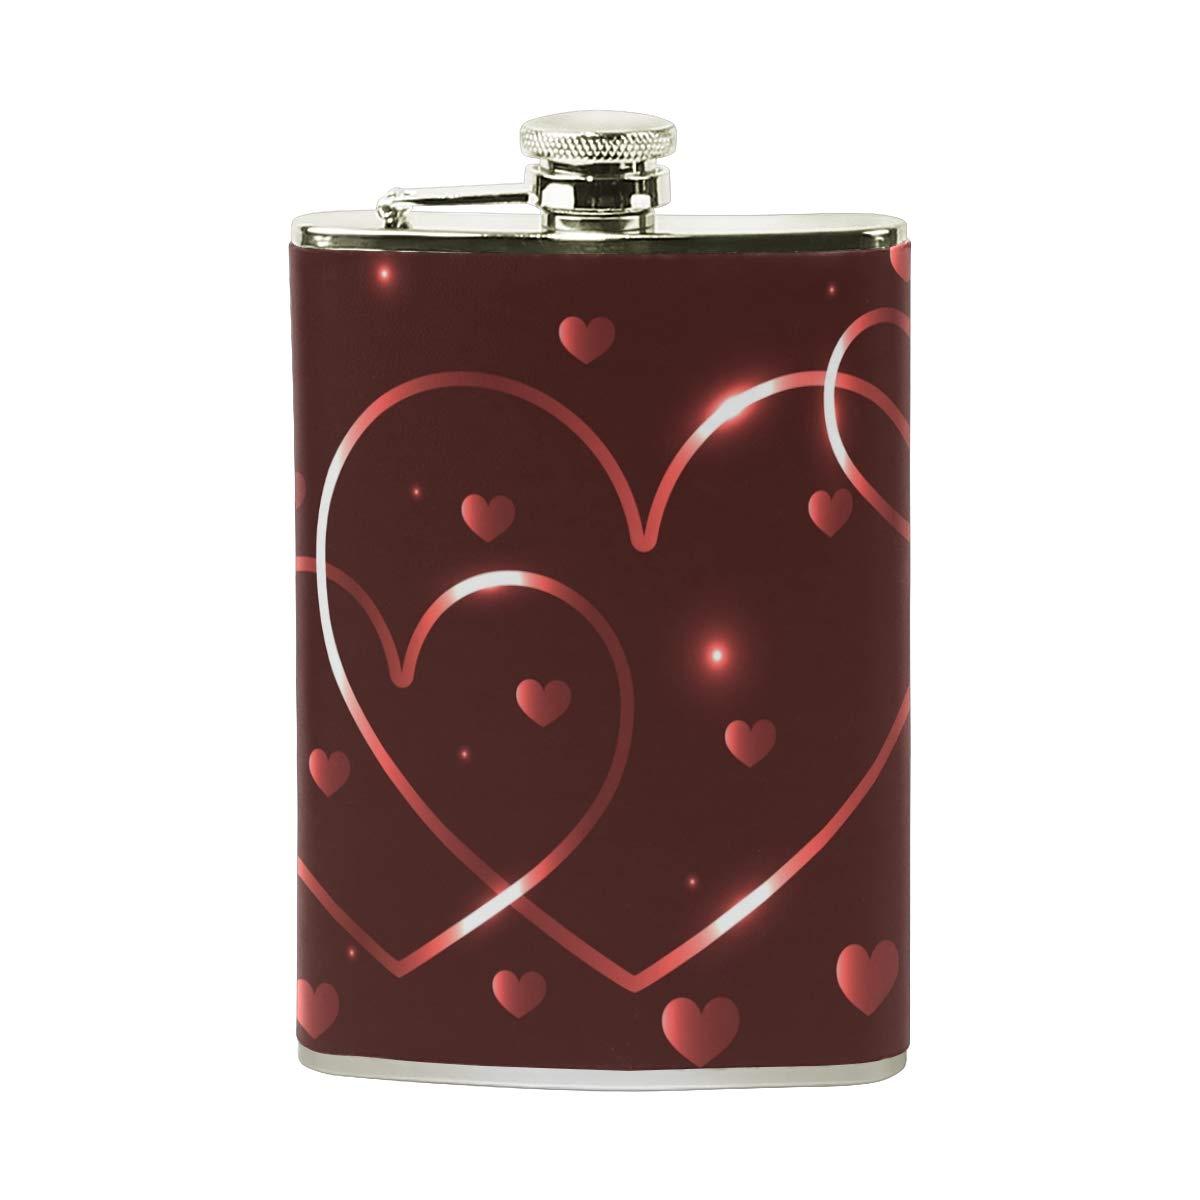 Orediy Flachmann mit roten Herzen, Edelstahl, 227 ml, tragbar, mit Leder ummantelt